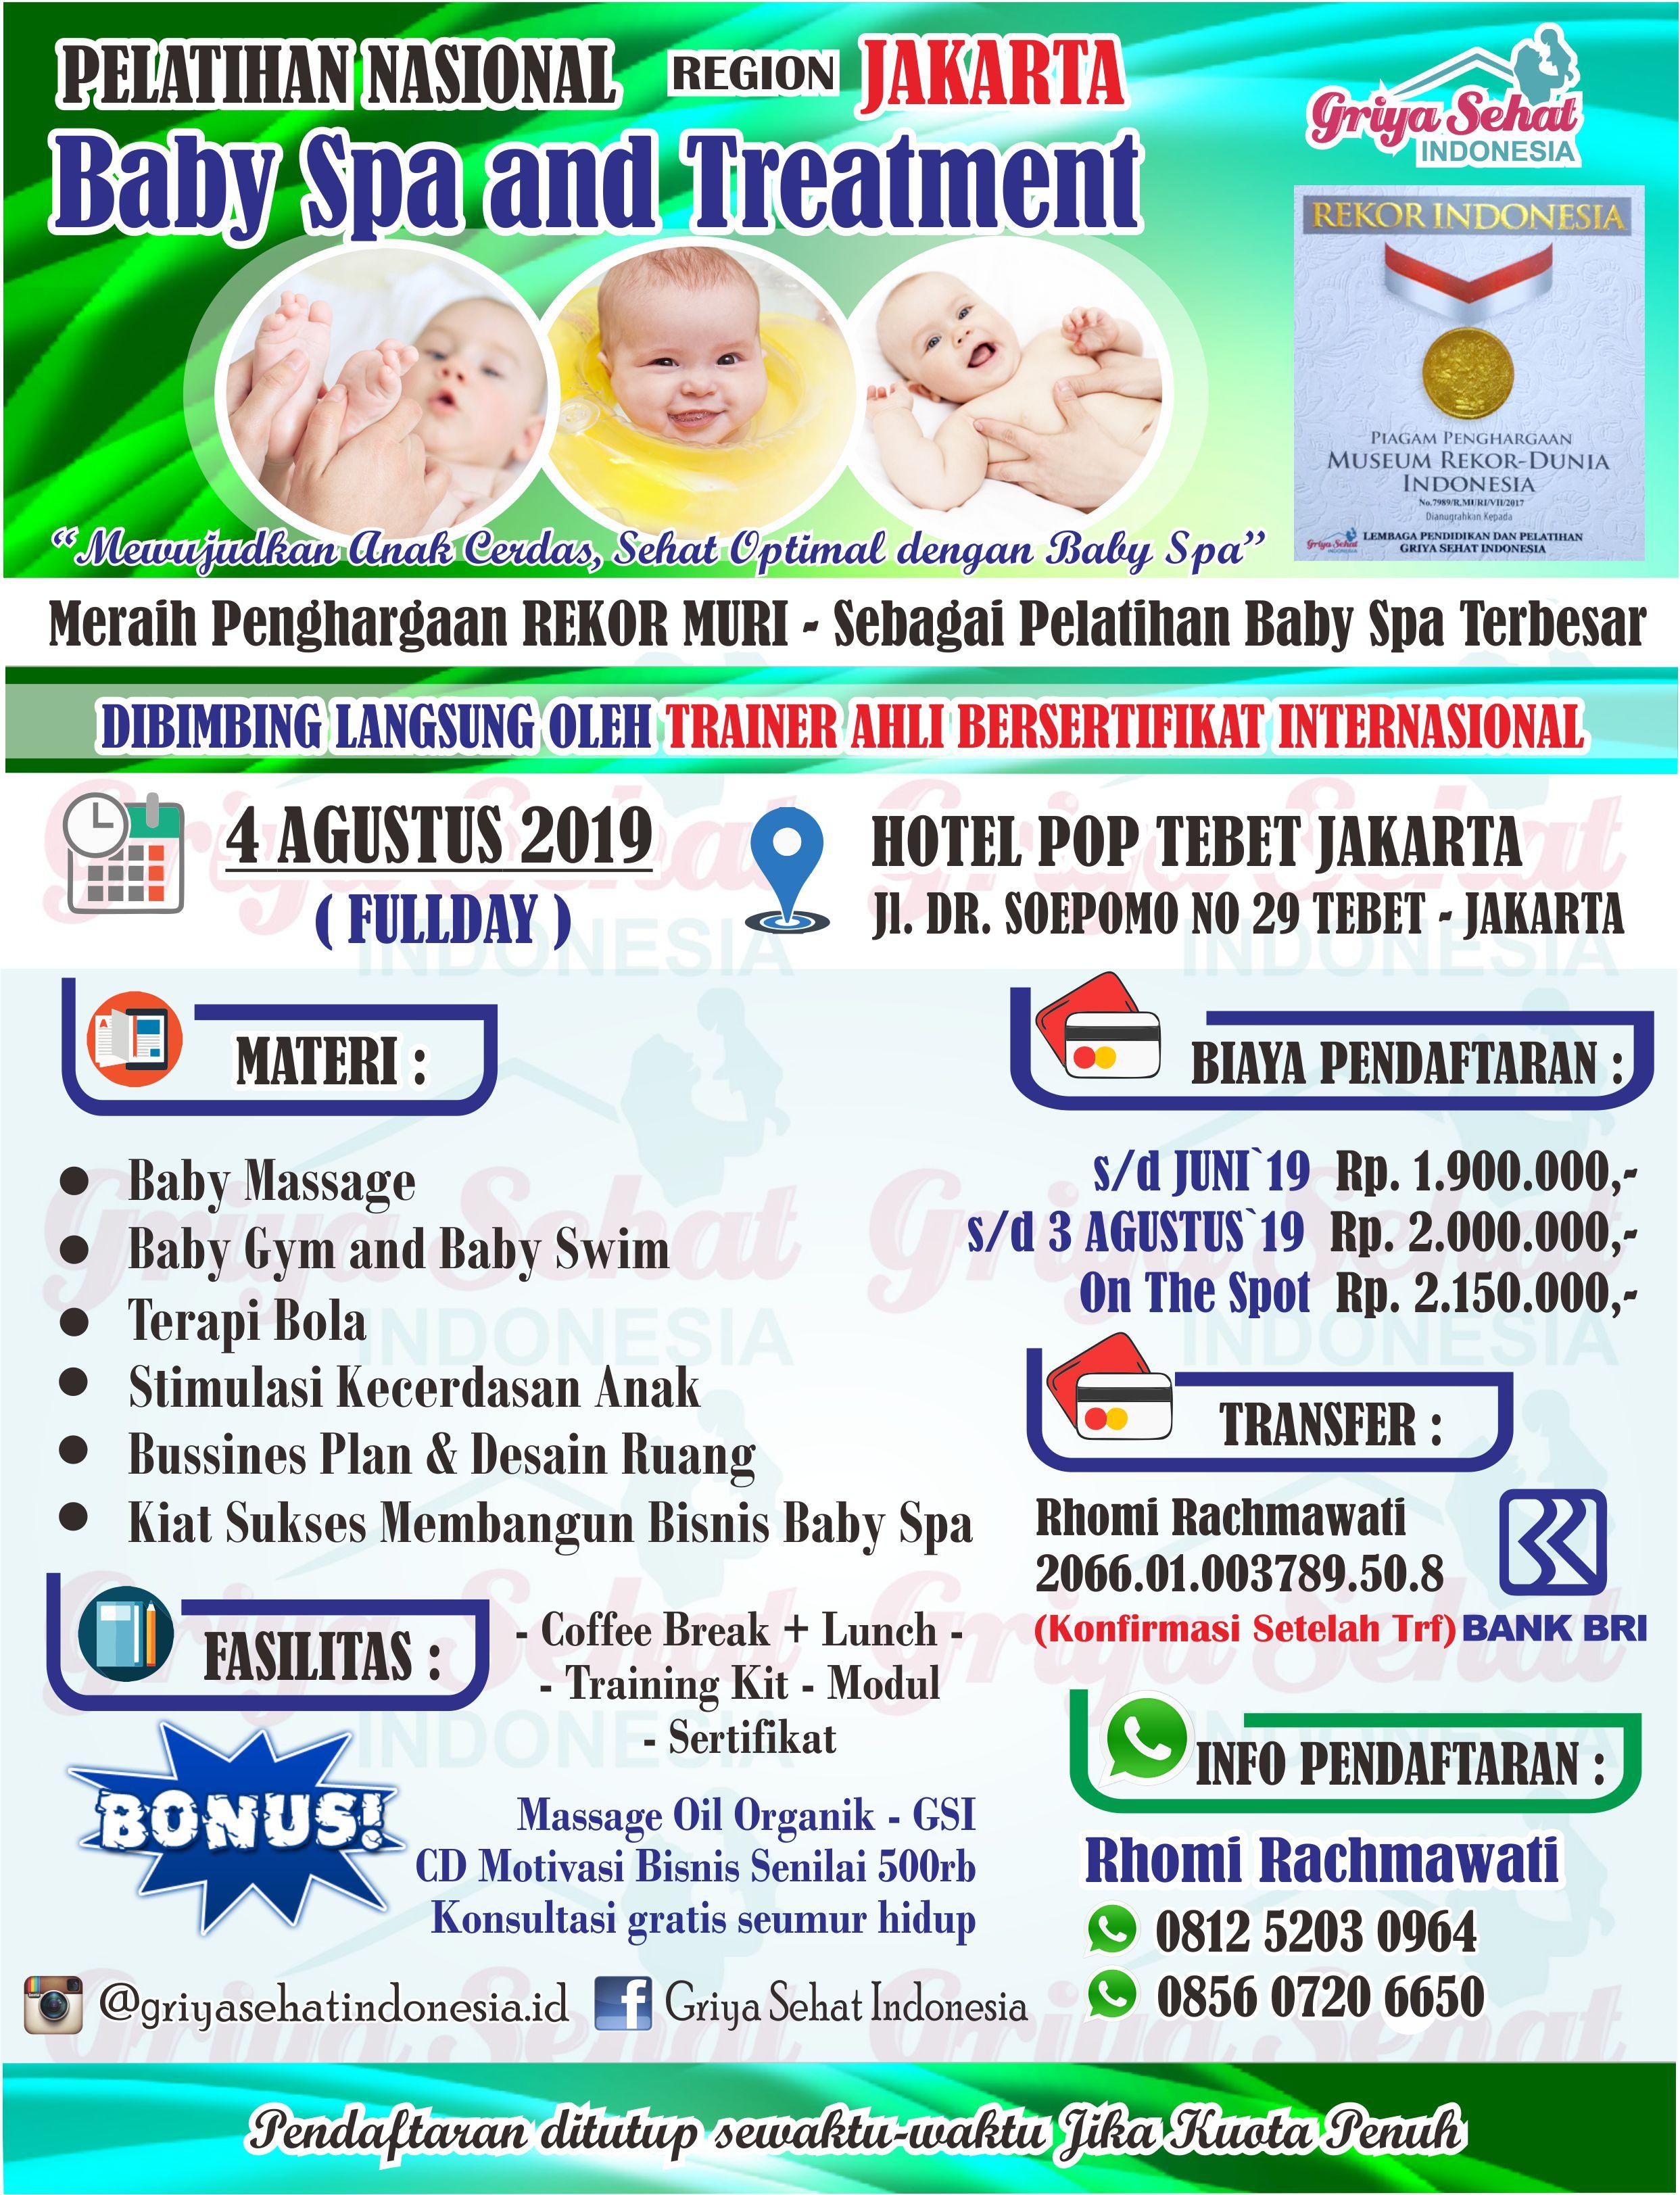 JAKARTA AGUSTUS 2019 R